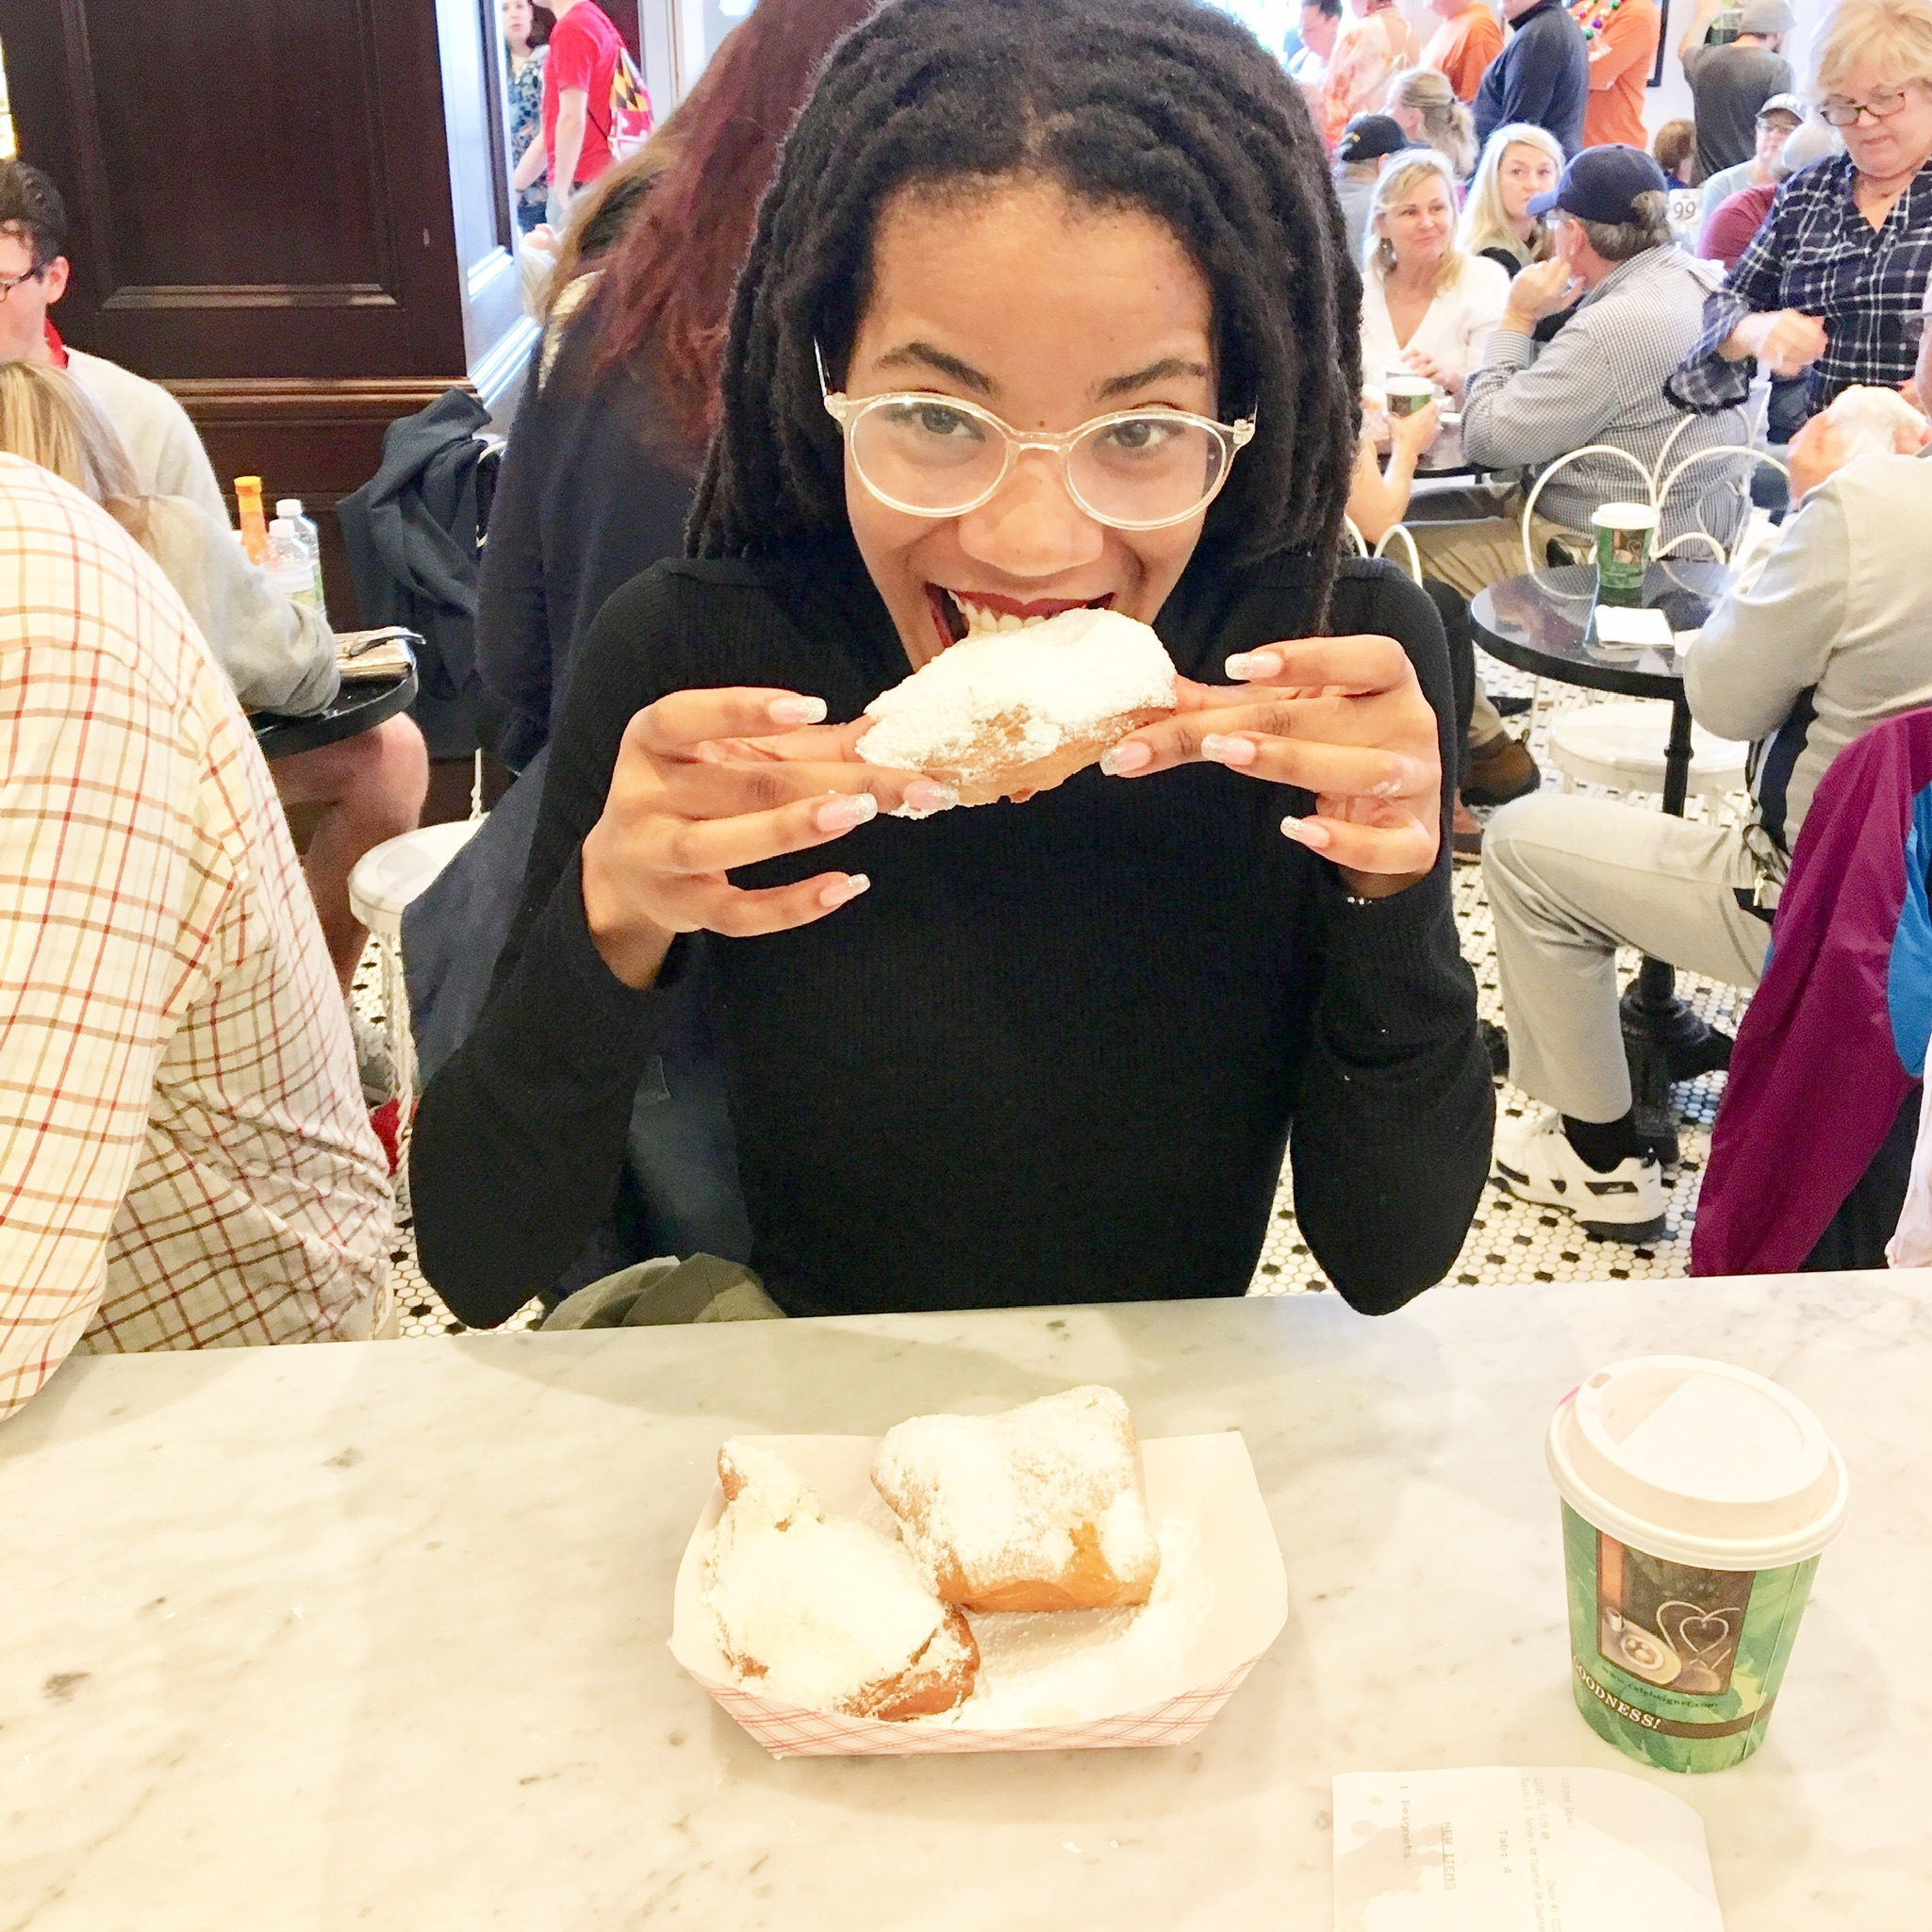 Food Finds: Cafe Beignet in New Orleans, LA